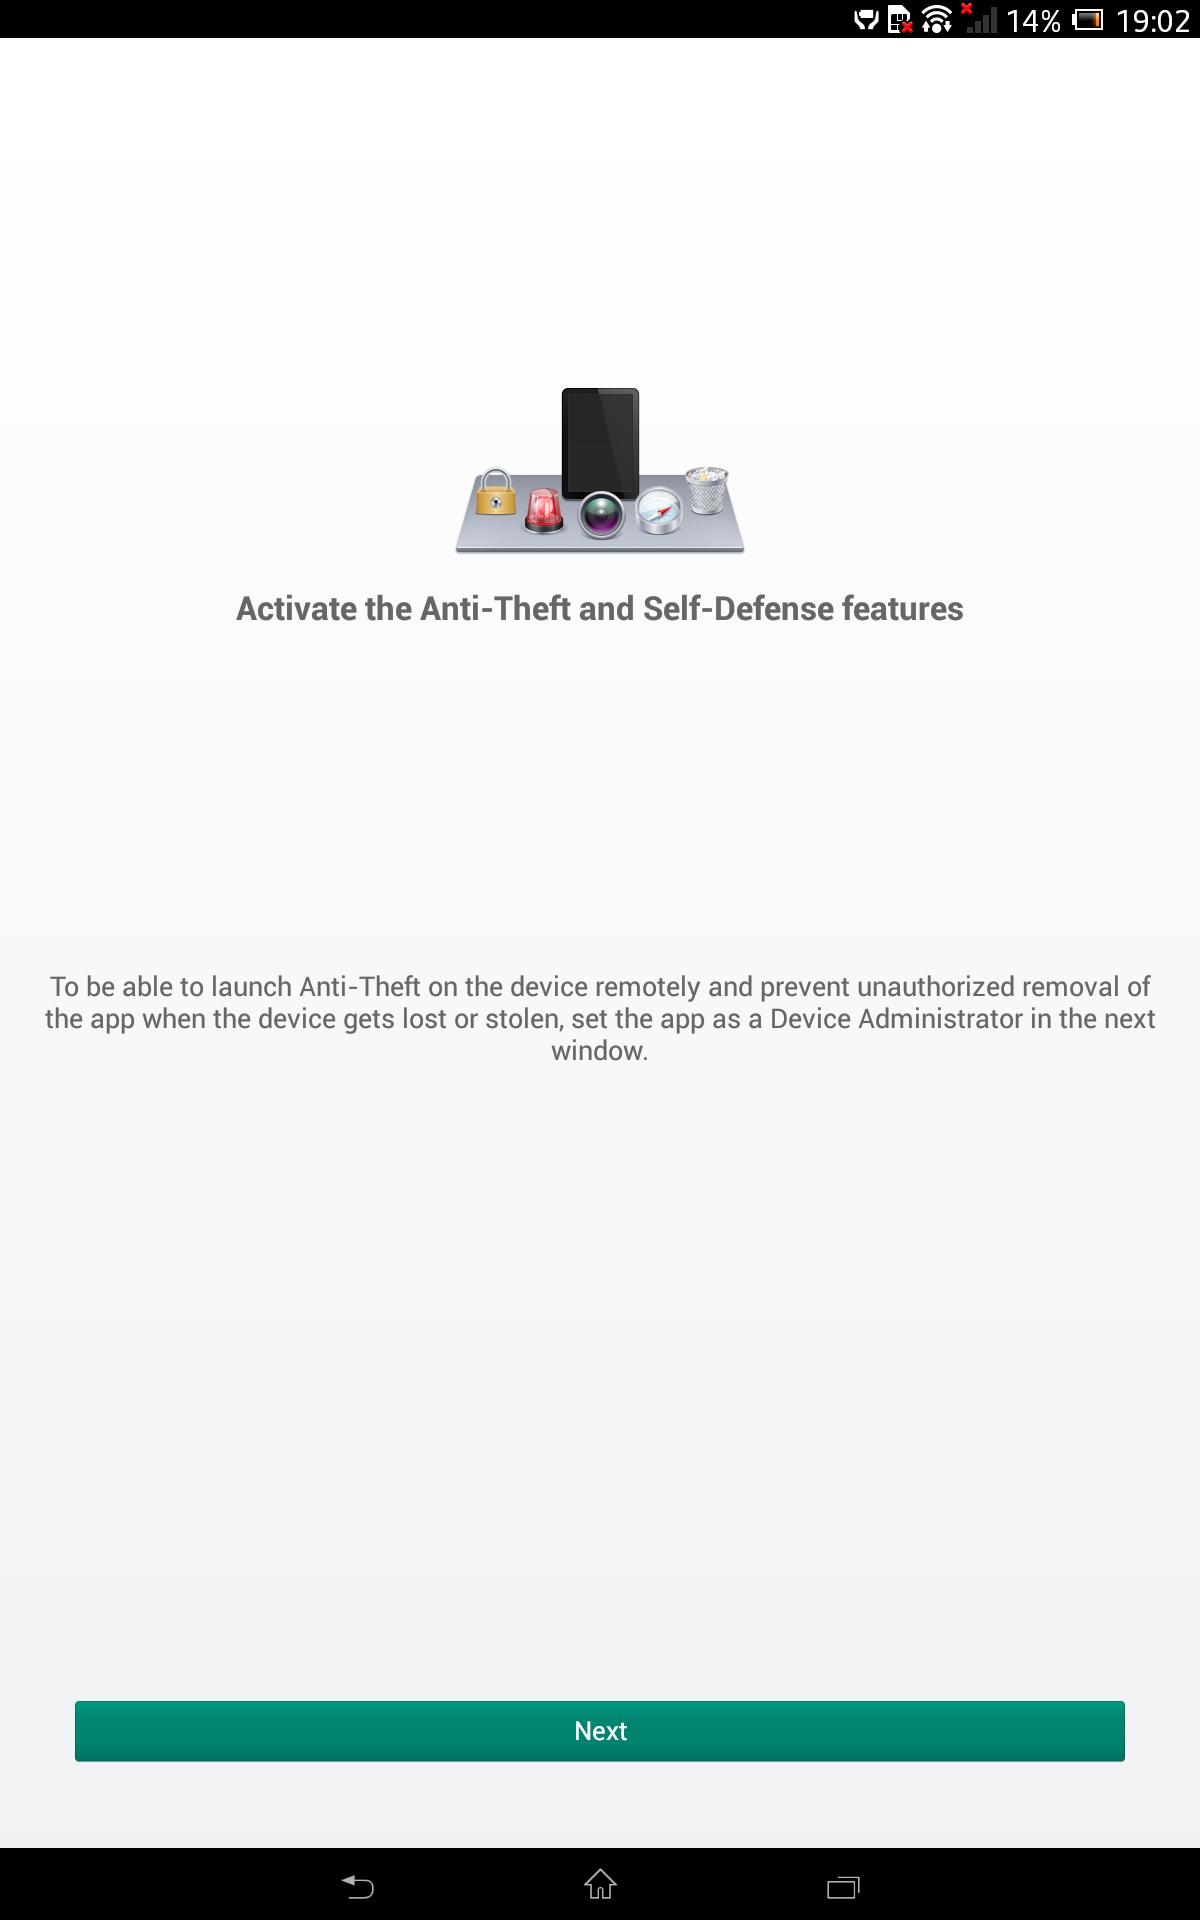 Sony Xpera Z tablet Screenshot 8